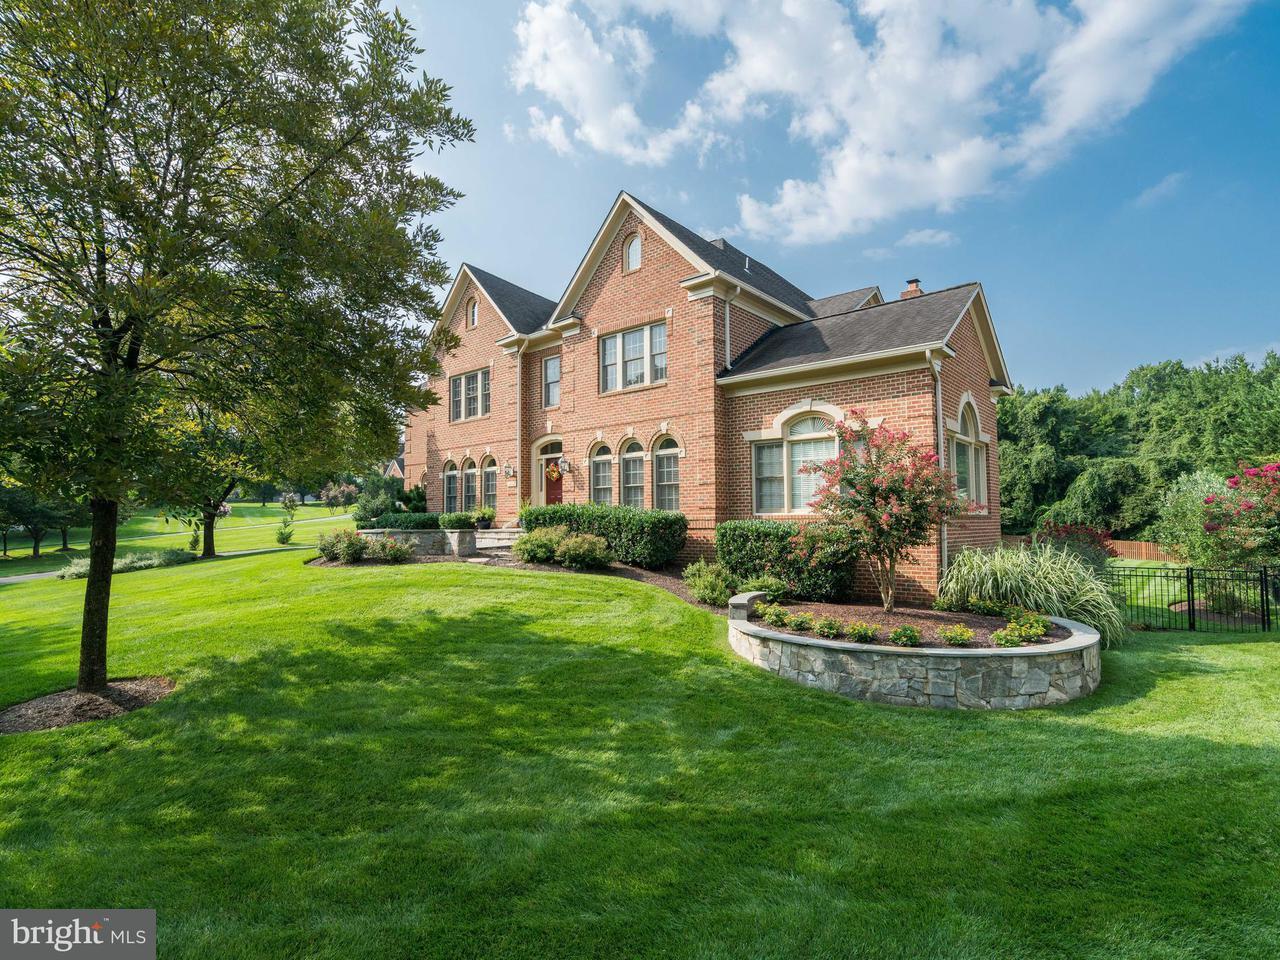 Single Family Home for Sale at 2802 Marshall Lake Drive 2802 Marshall Lake Drive Oakton, Virginia 22124 United States